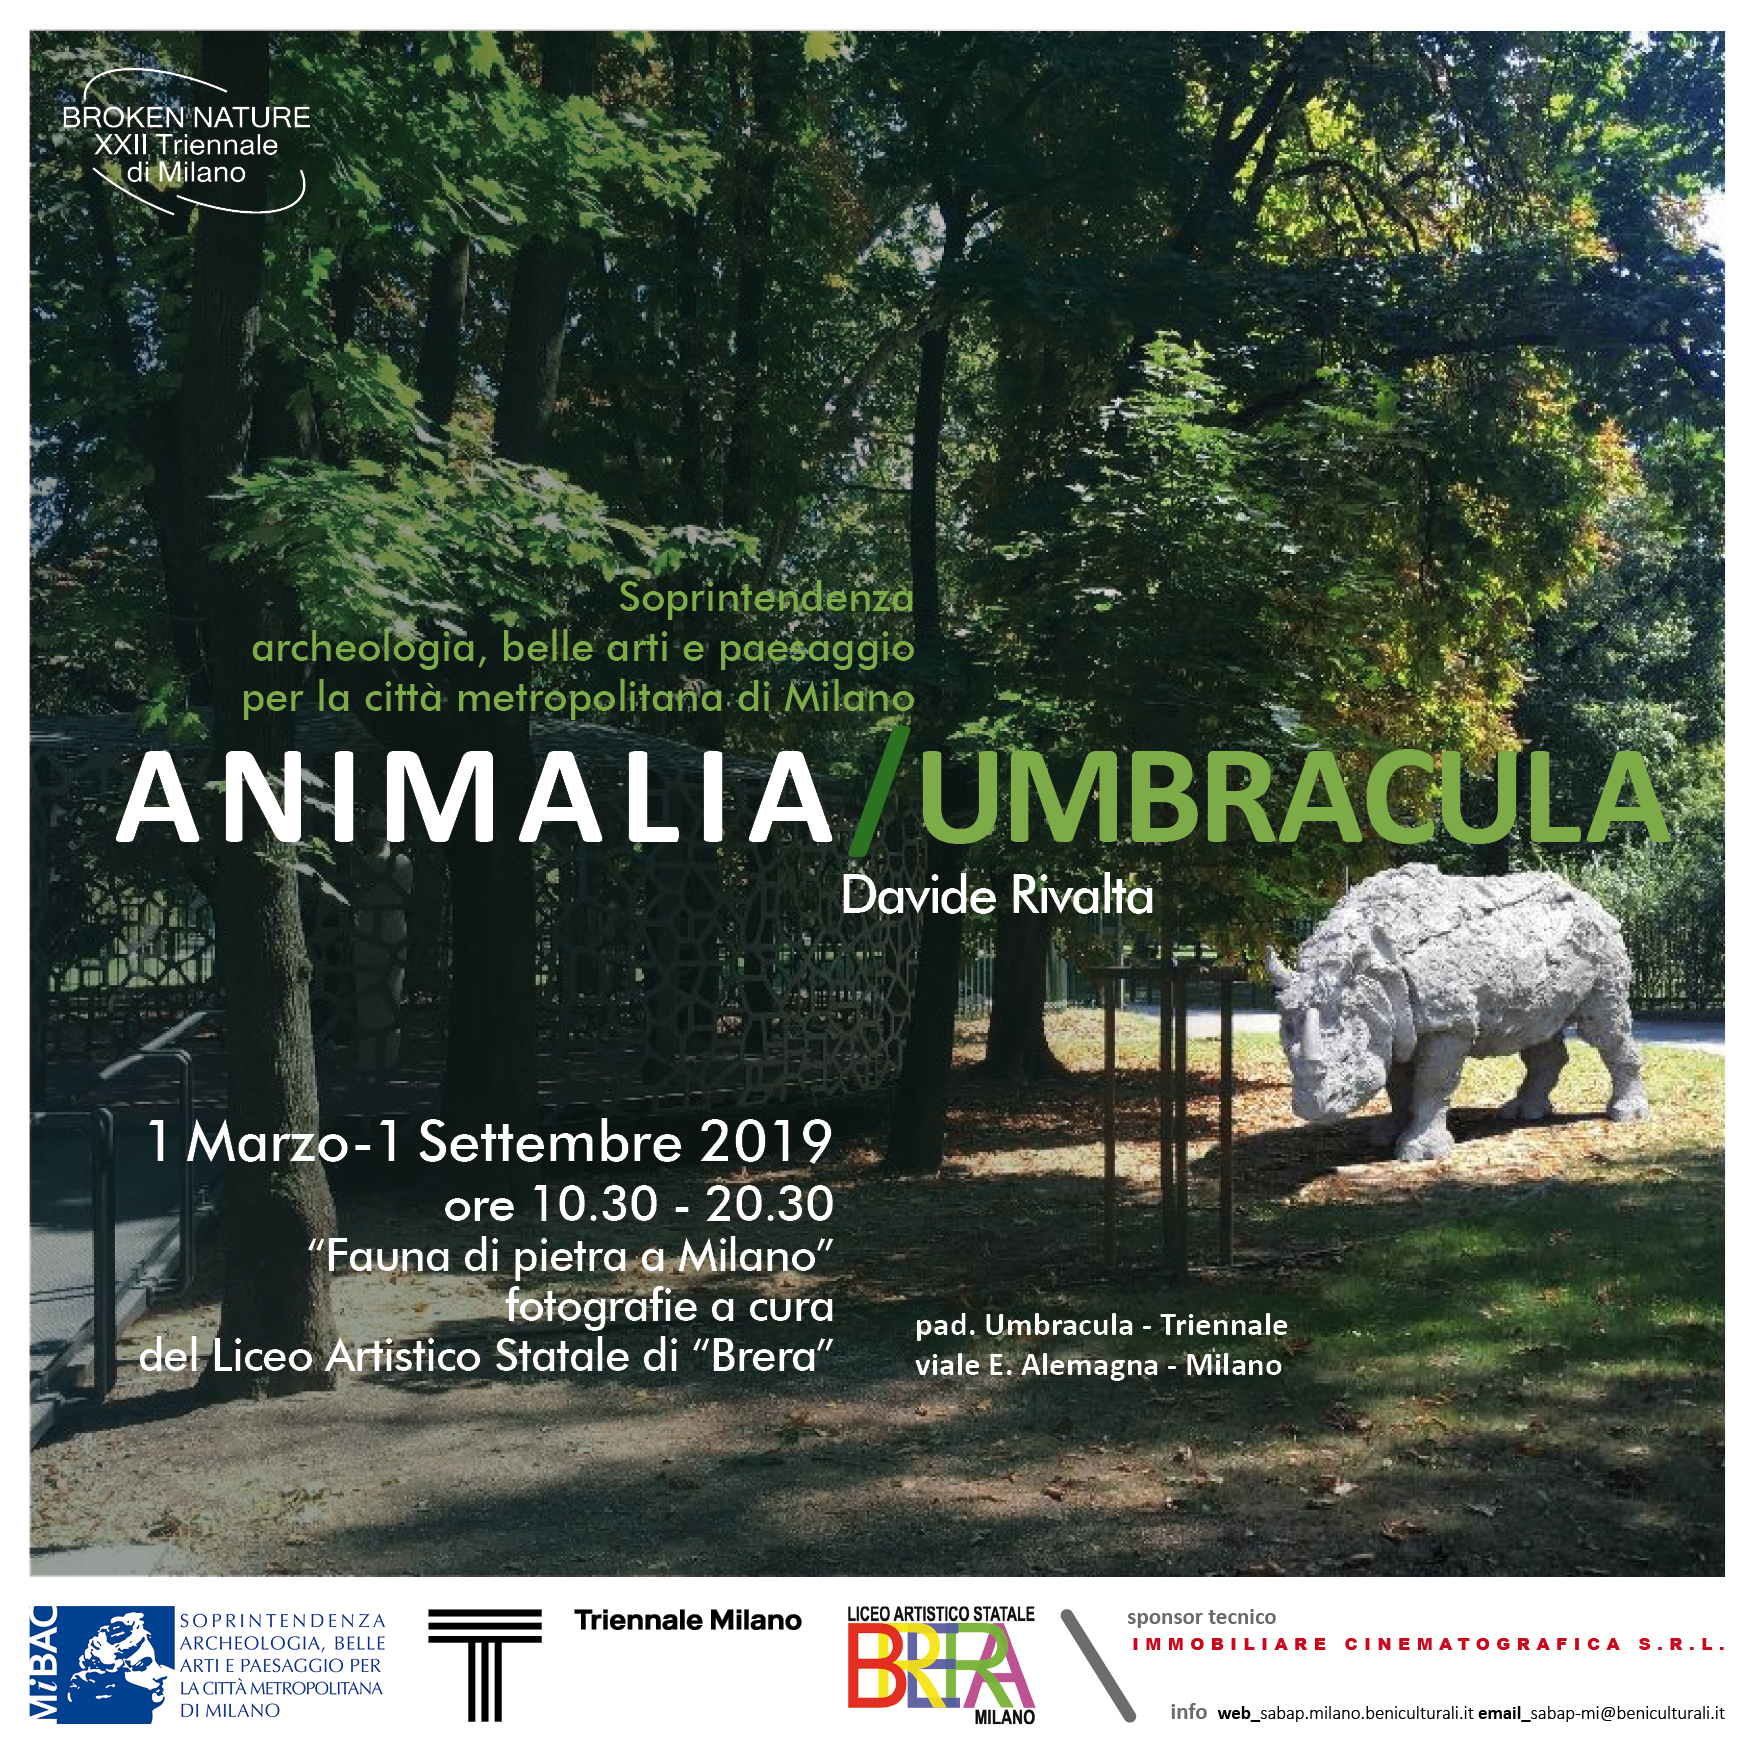 Animalia/Umbracula – Davide Rivalta // 1 marzo -1 settembre 2019